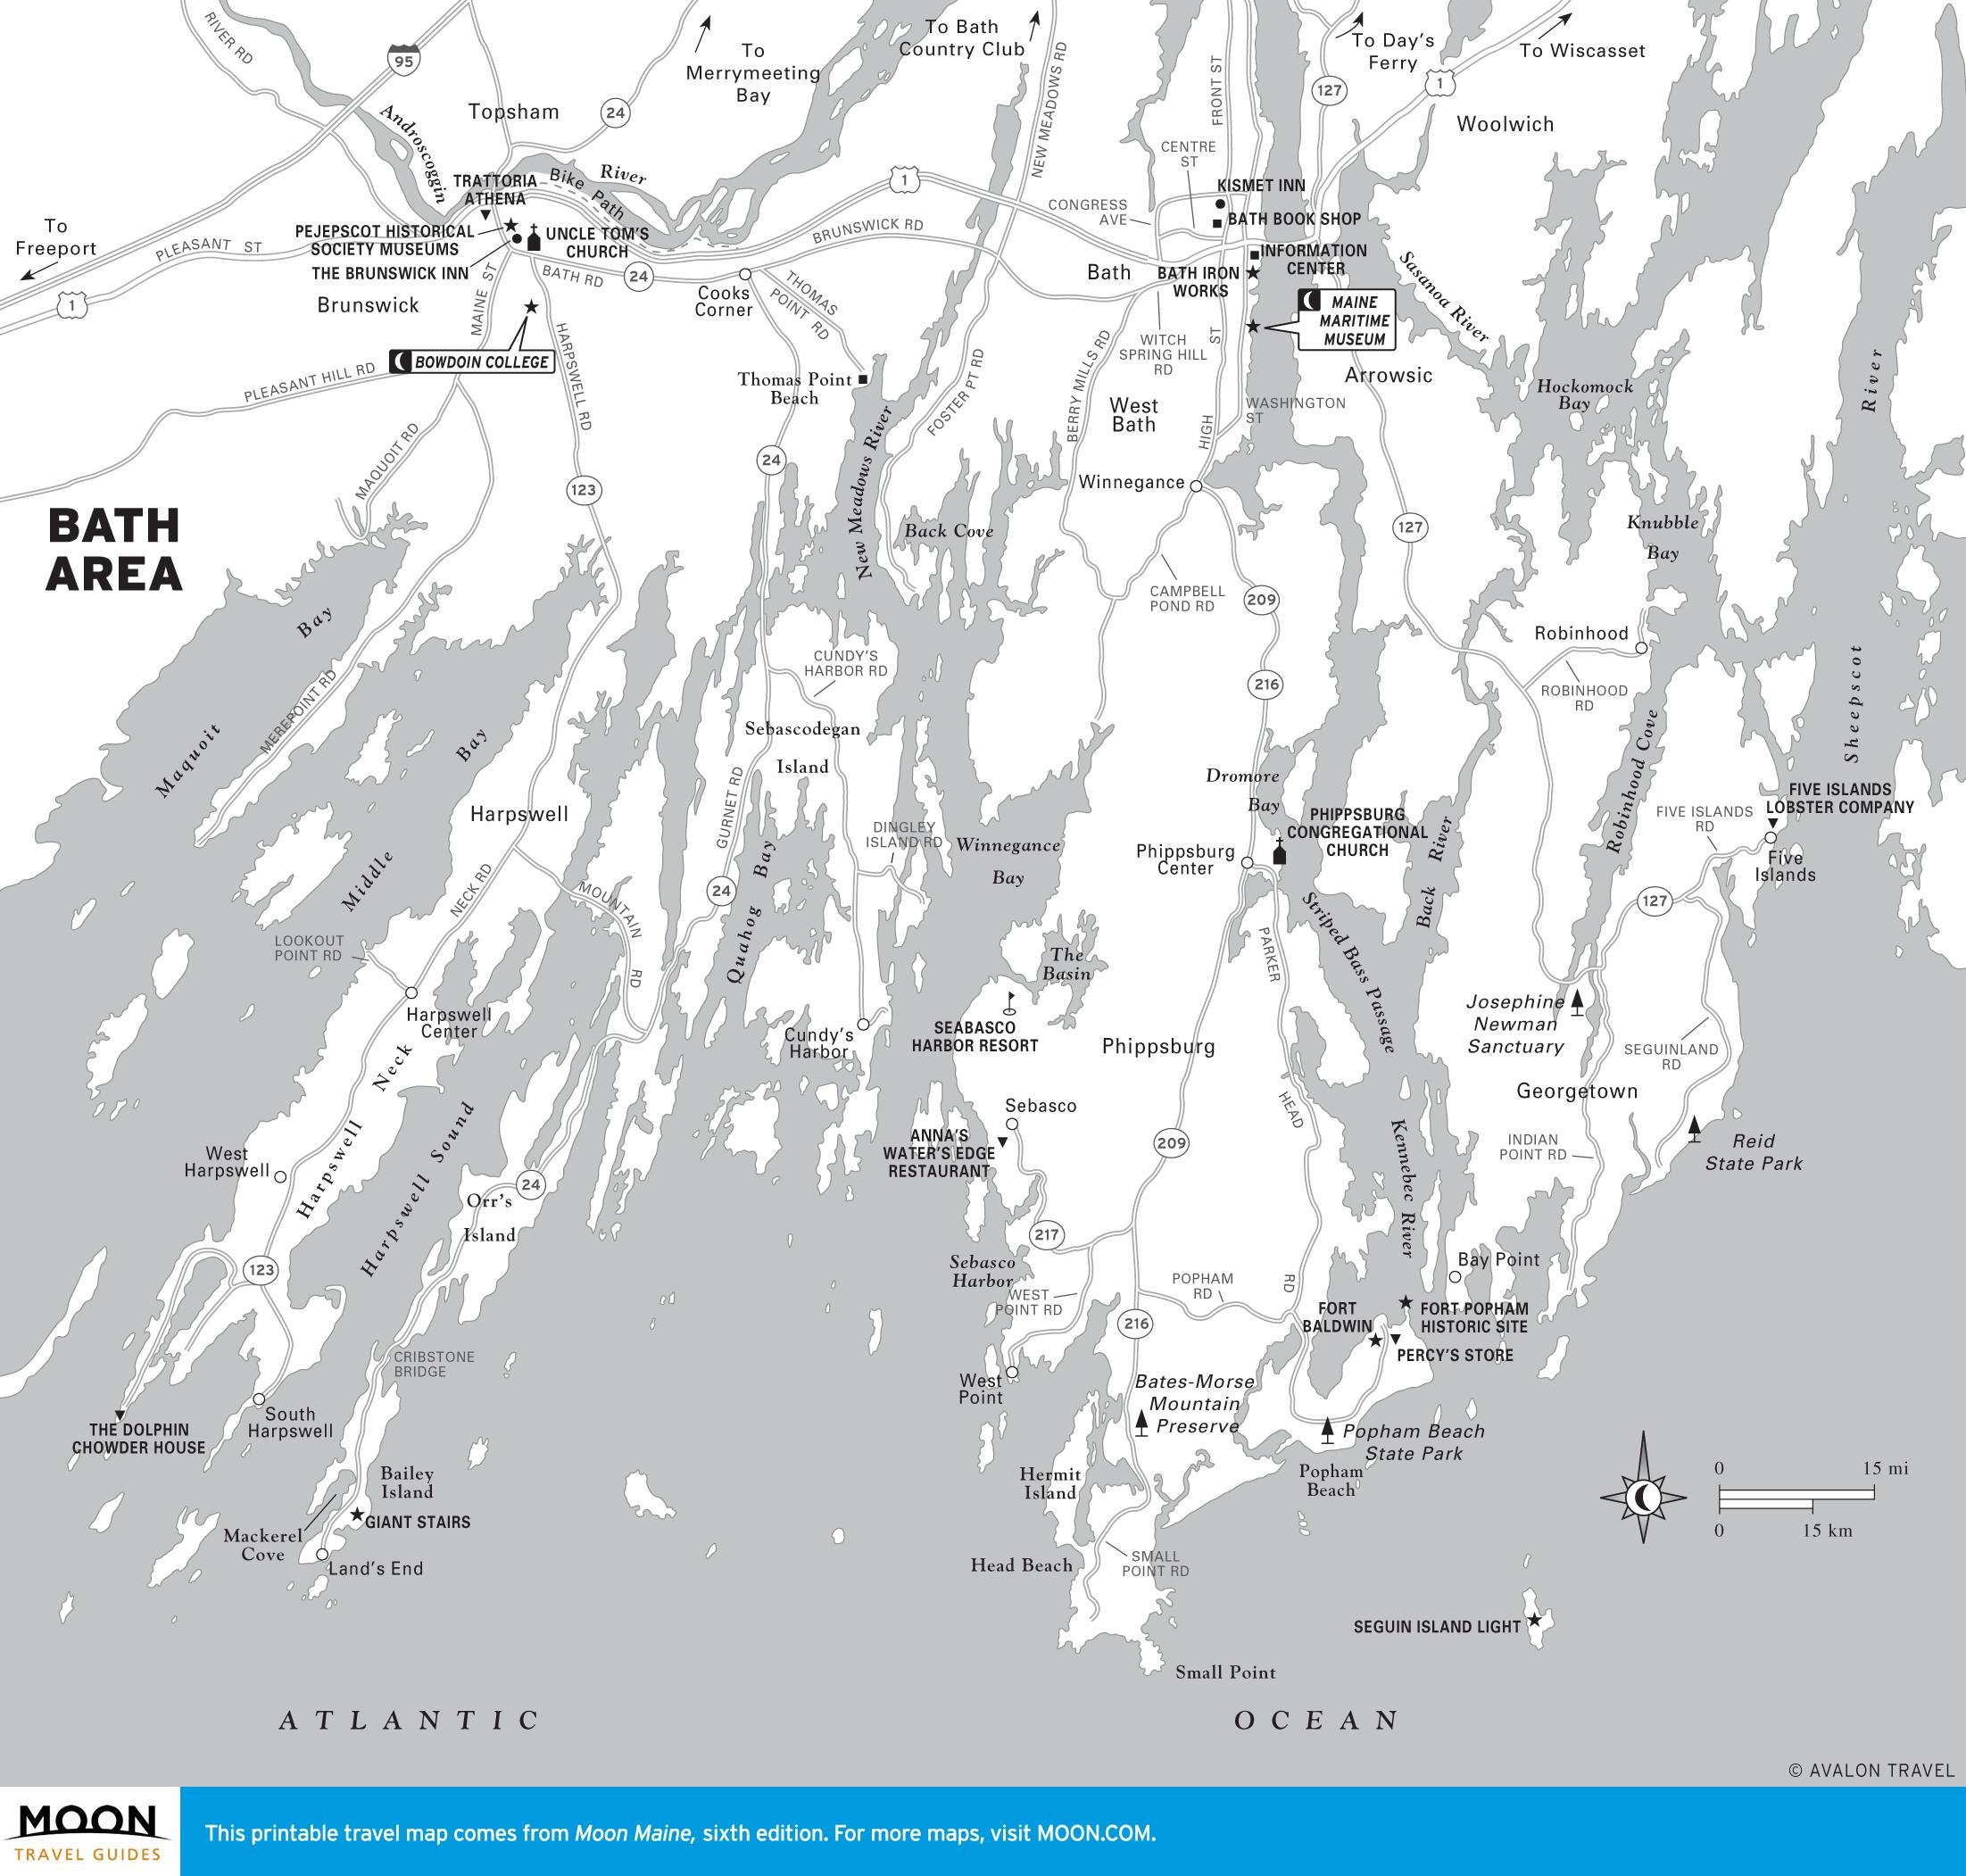 Maine Travel The World - Printable Map Of Maine Coast